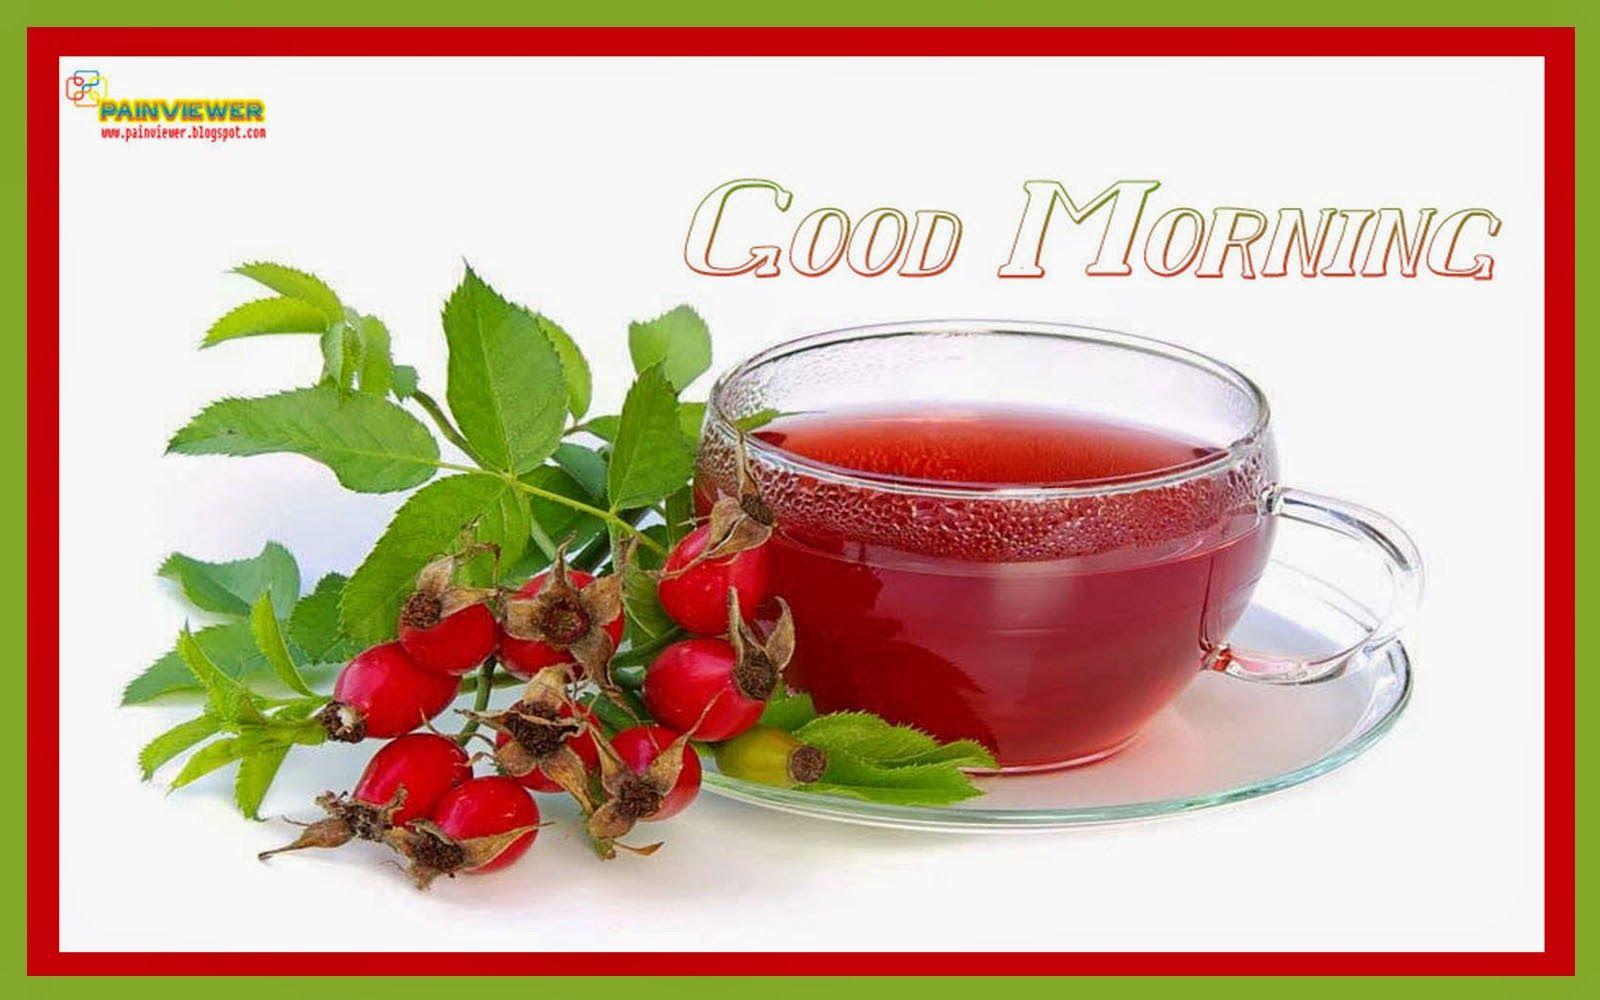 Good Morning Hd Wallpaper Coffe Wallpaper Flower Tea Wallpaper